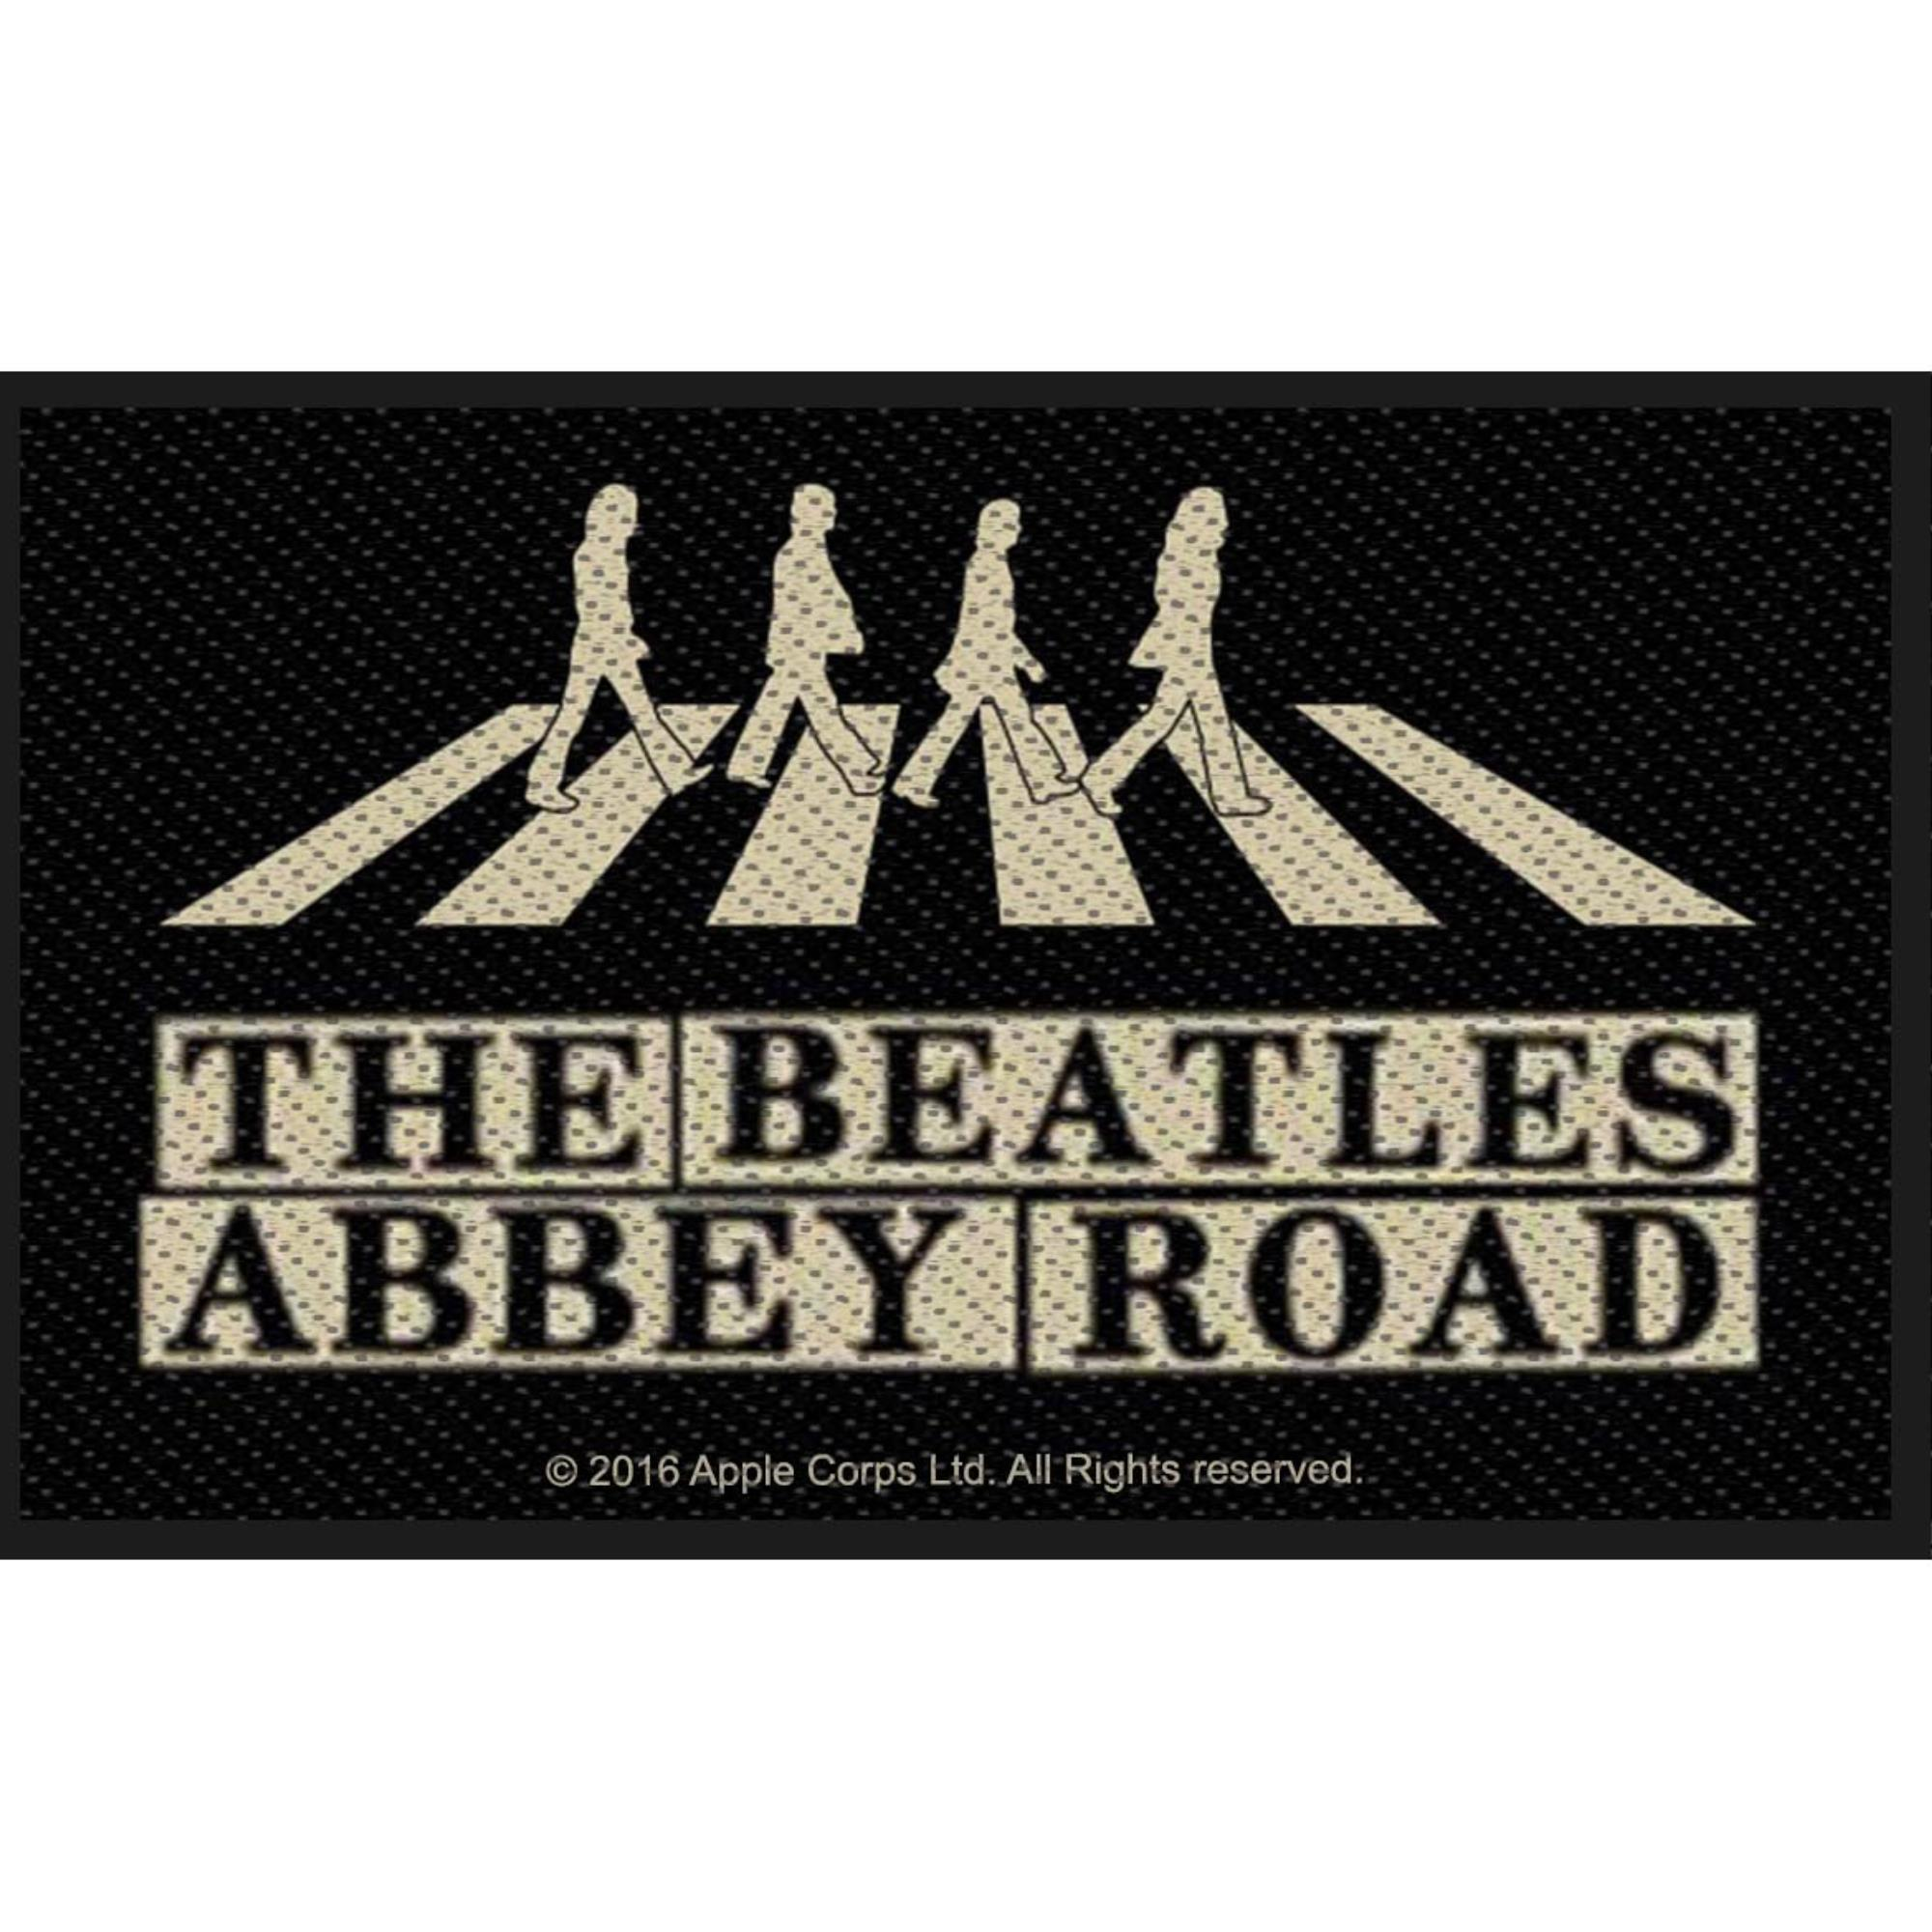 Abbey Road Crossing Patch